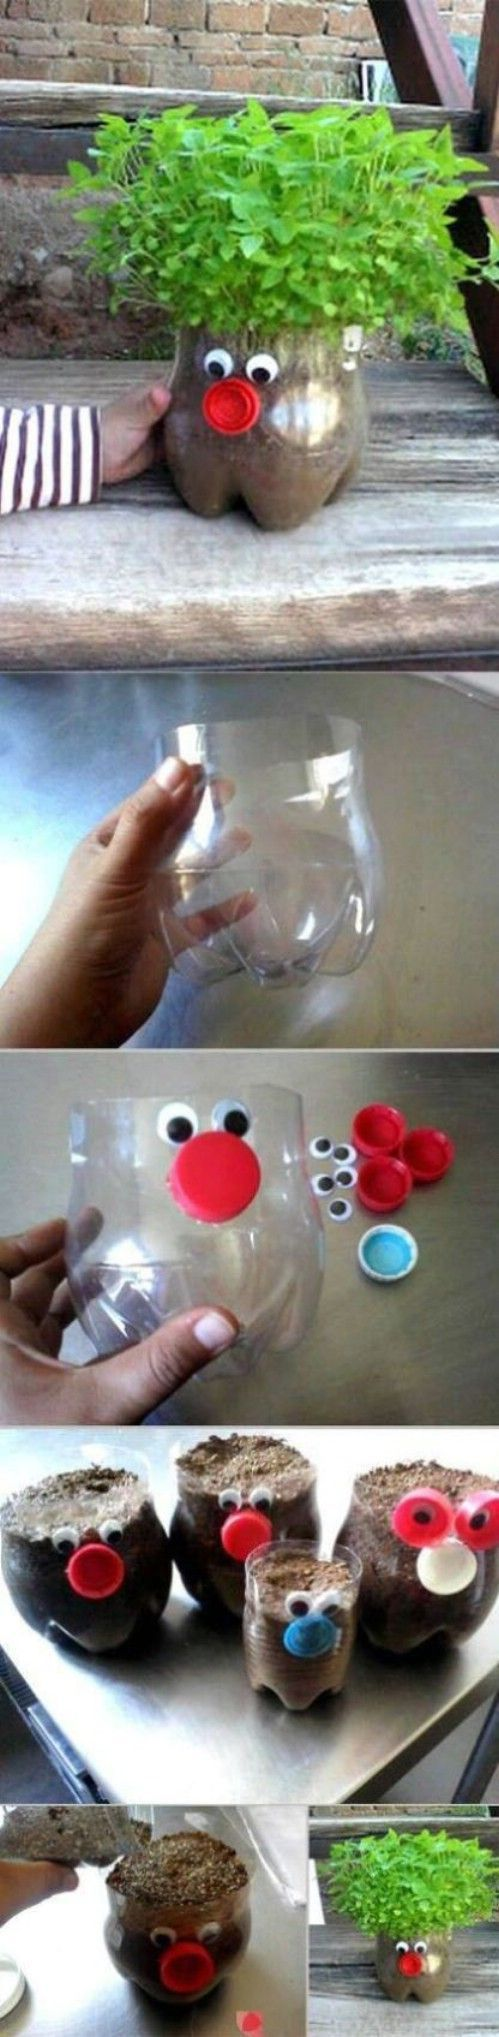 garrafas-de-plástico-reutilizadas-17